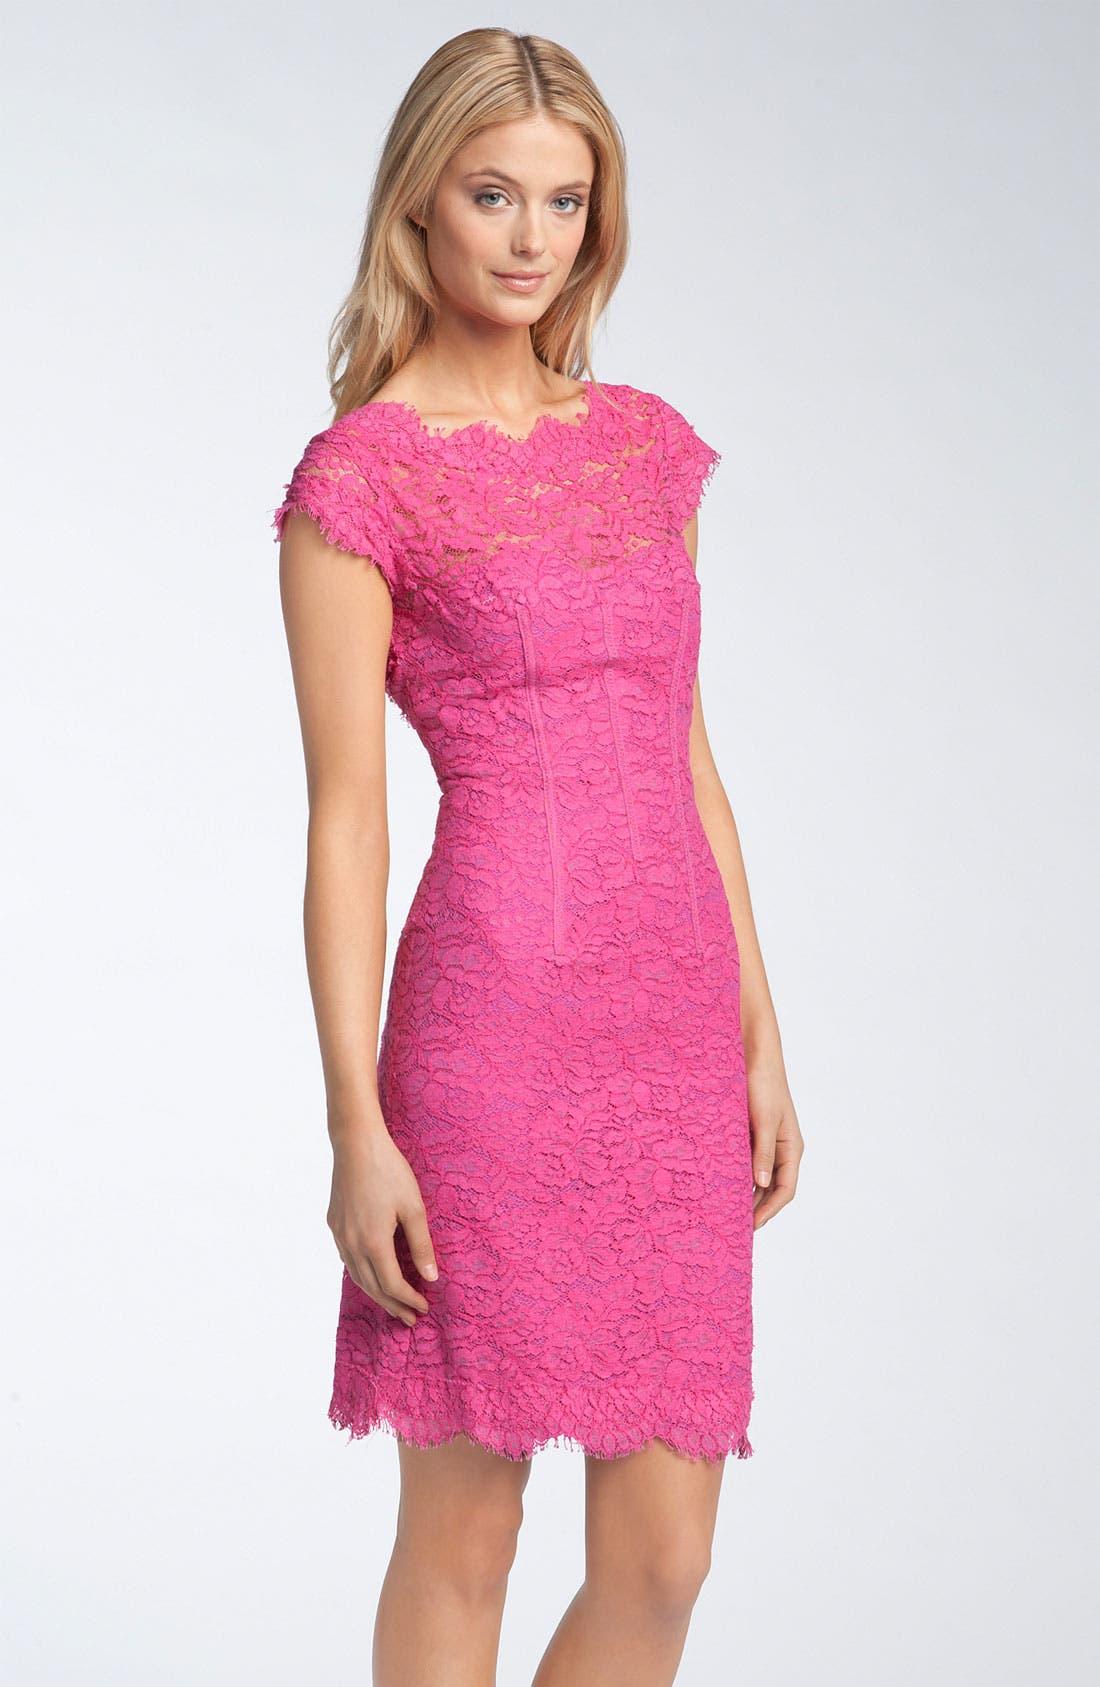 Main Image - ML Monique Lhuillier Lace Overlay Sheath Dress